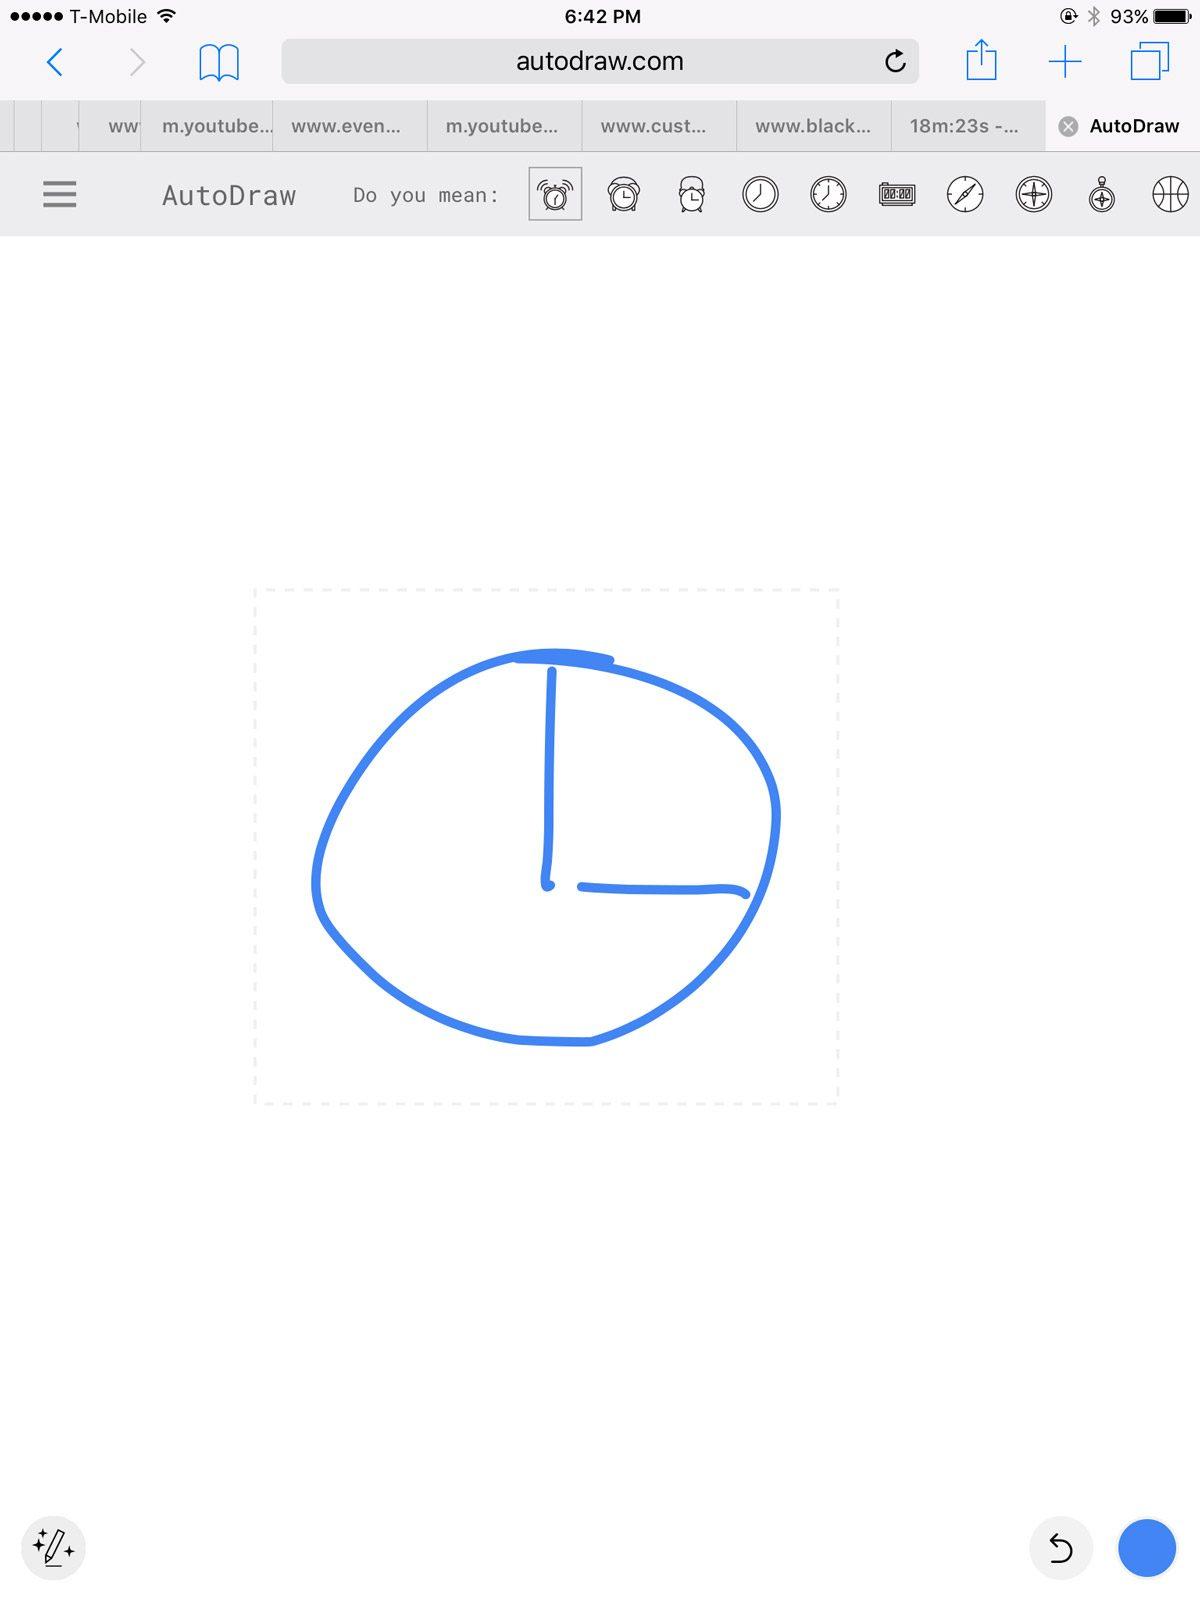 Ugly Scrawl of a Clock